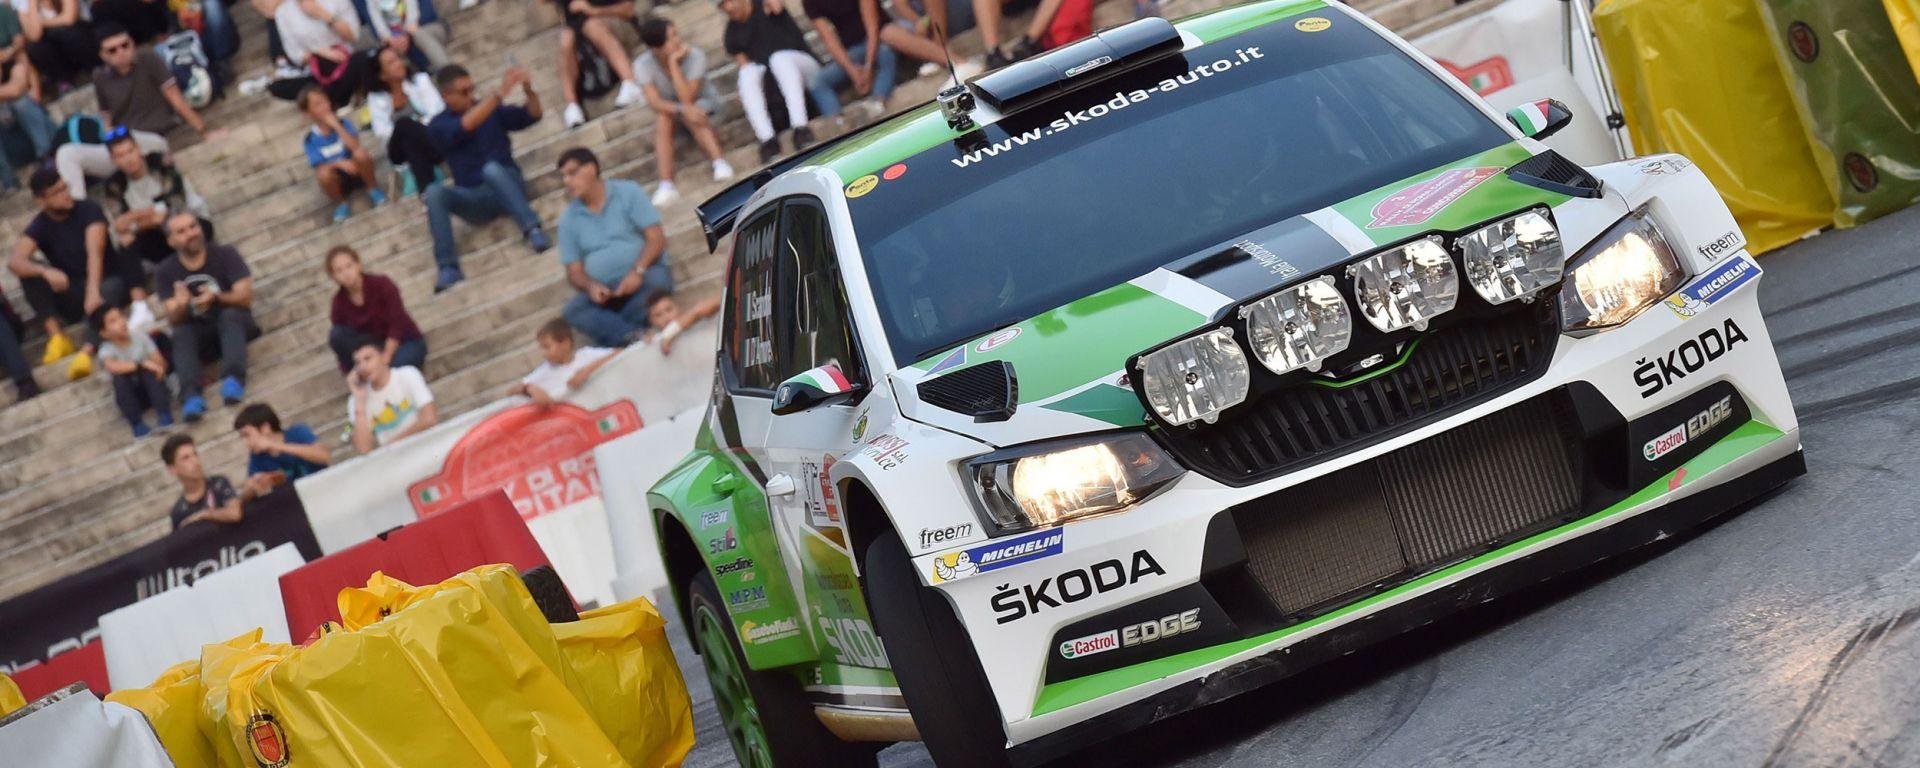 CIR, Gara 2, Rally Roma Capitale: trionfano Scandola e la Skoda